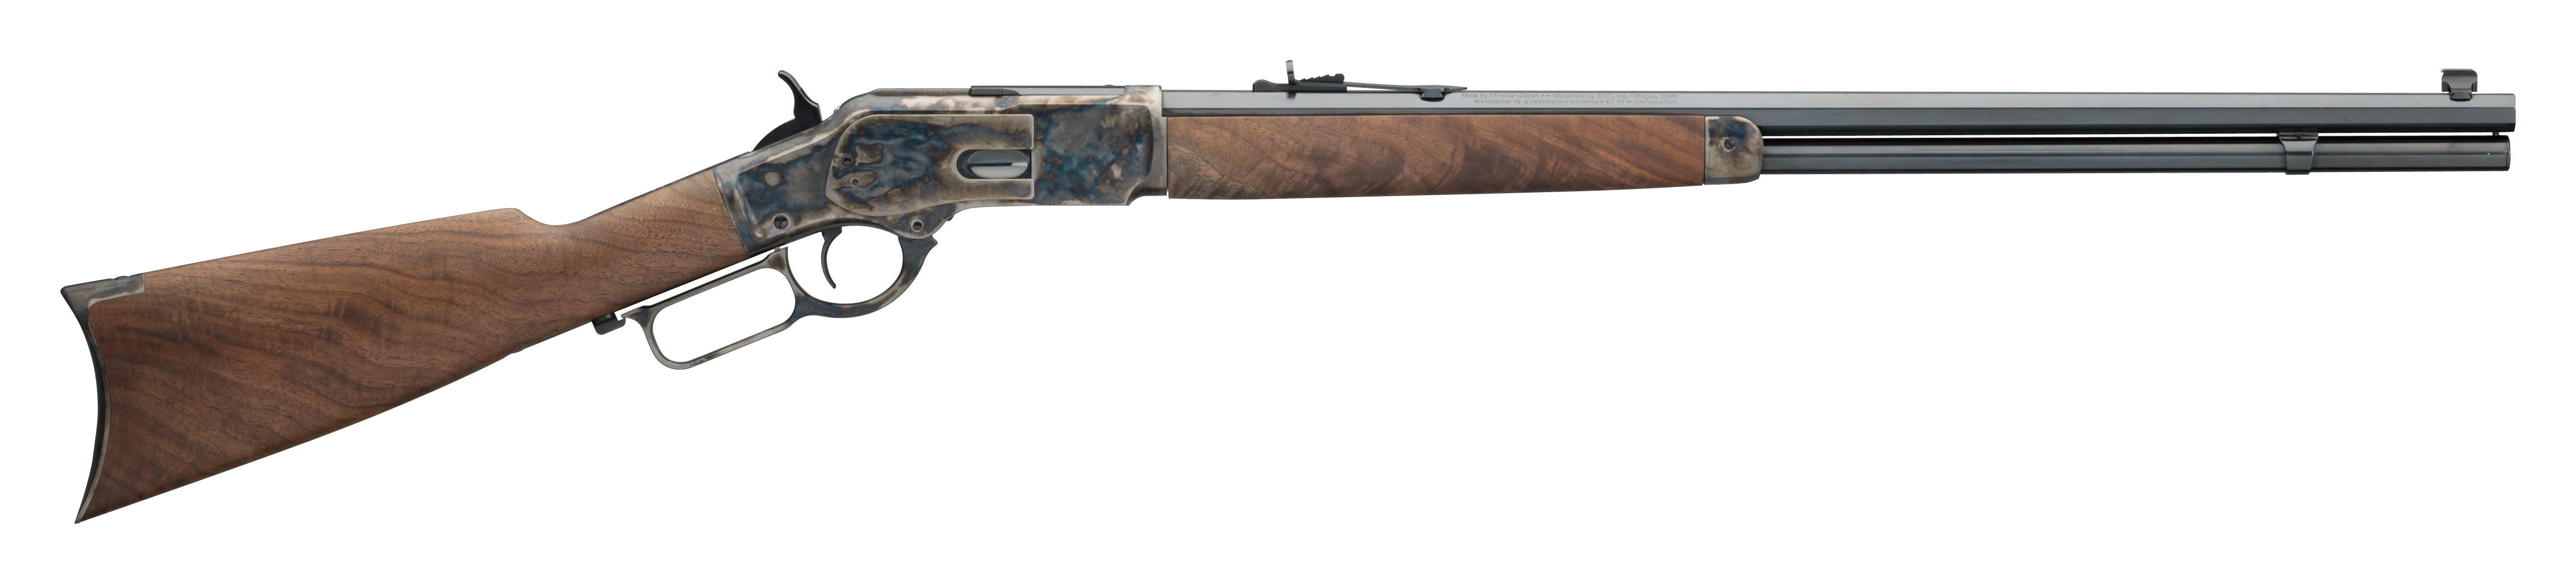 Winchester 1873 SPORTER 44-40